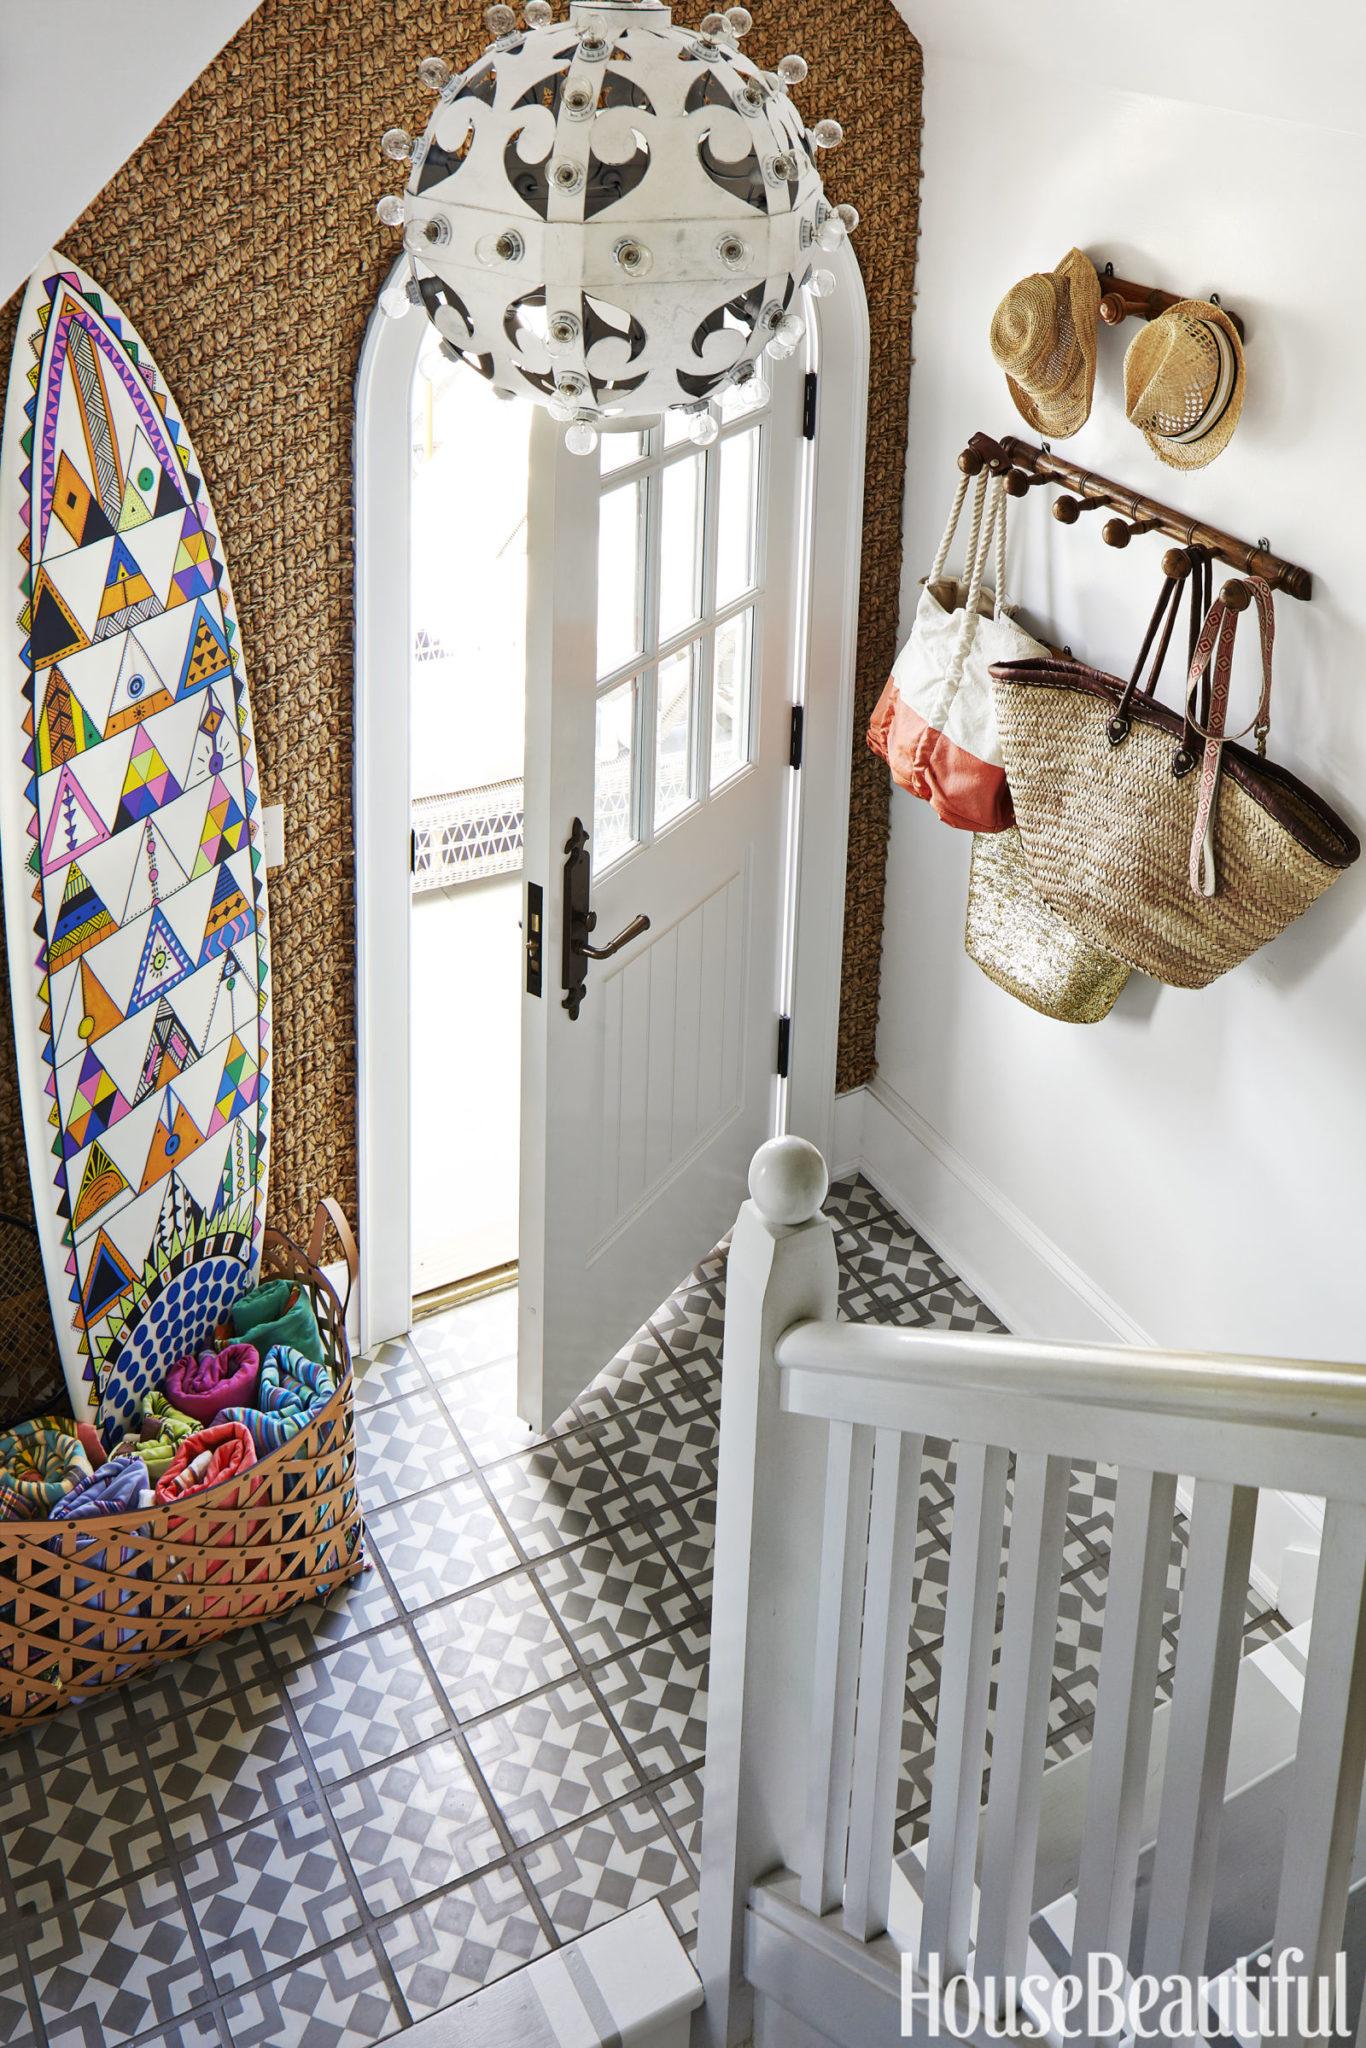 Minimalist-coastal-entryway-with-a-simple-coat-rack-